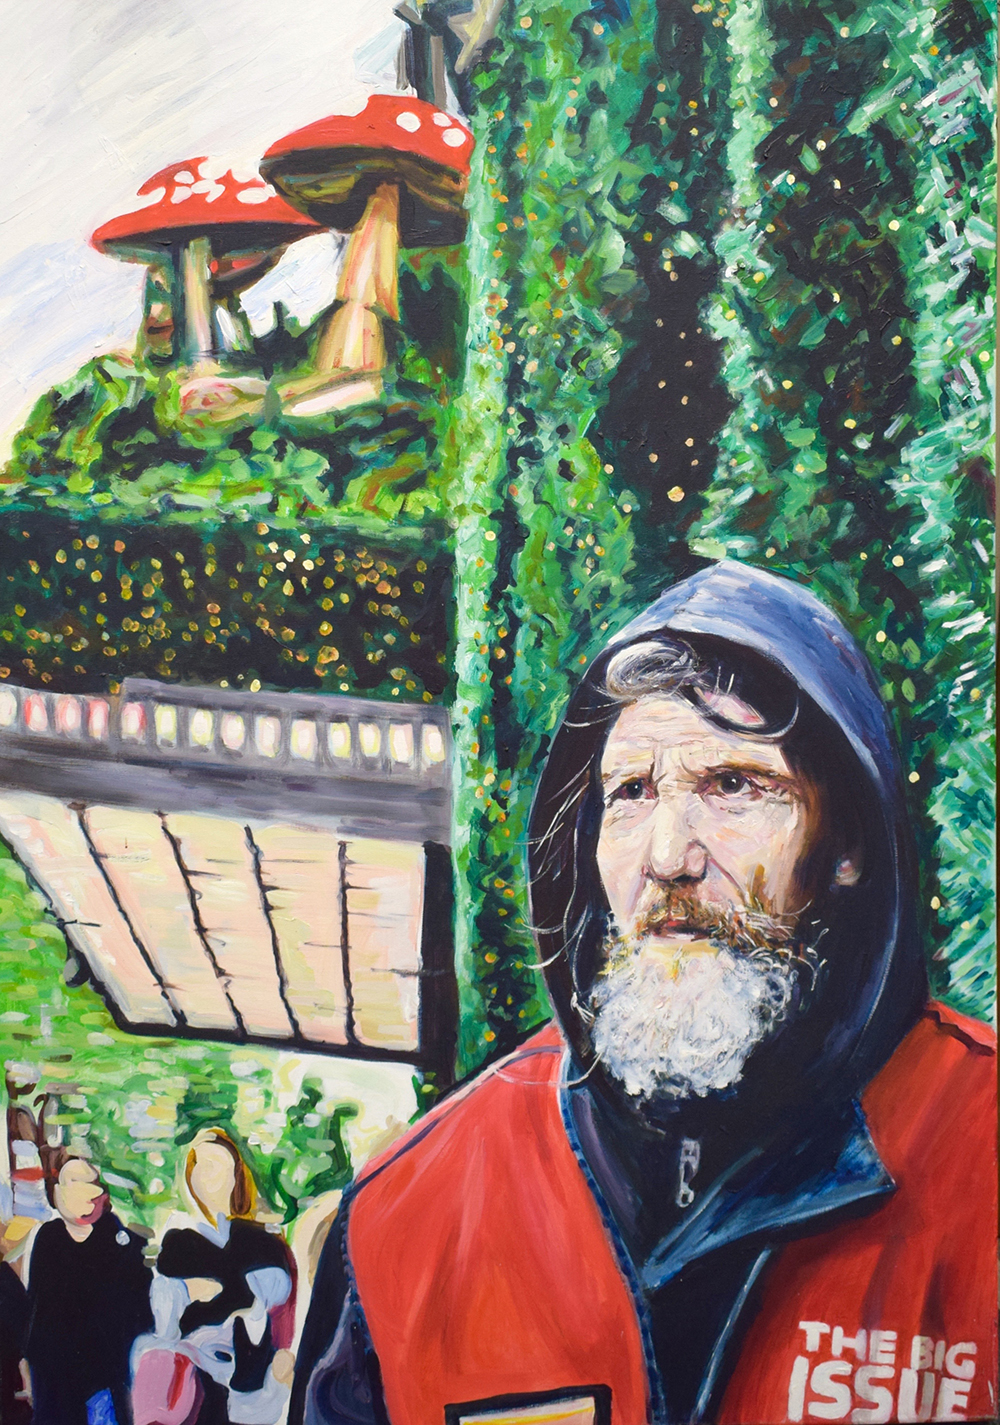 Brian, 2014 | Oil on canvas | 70 x 100 cm | £600